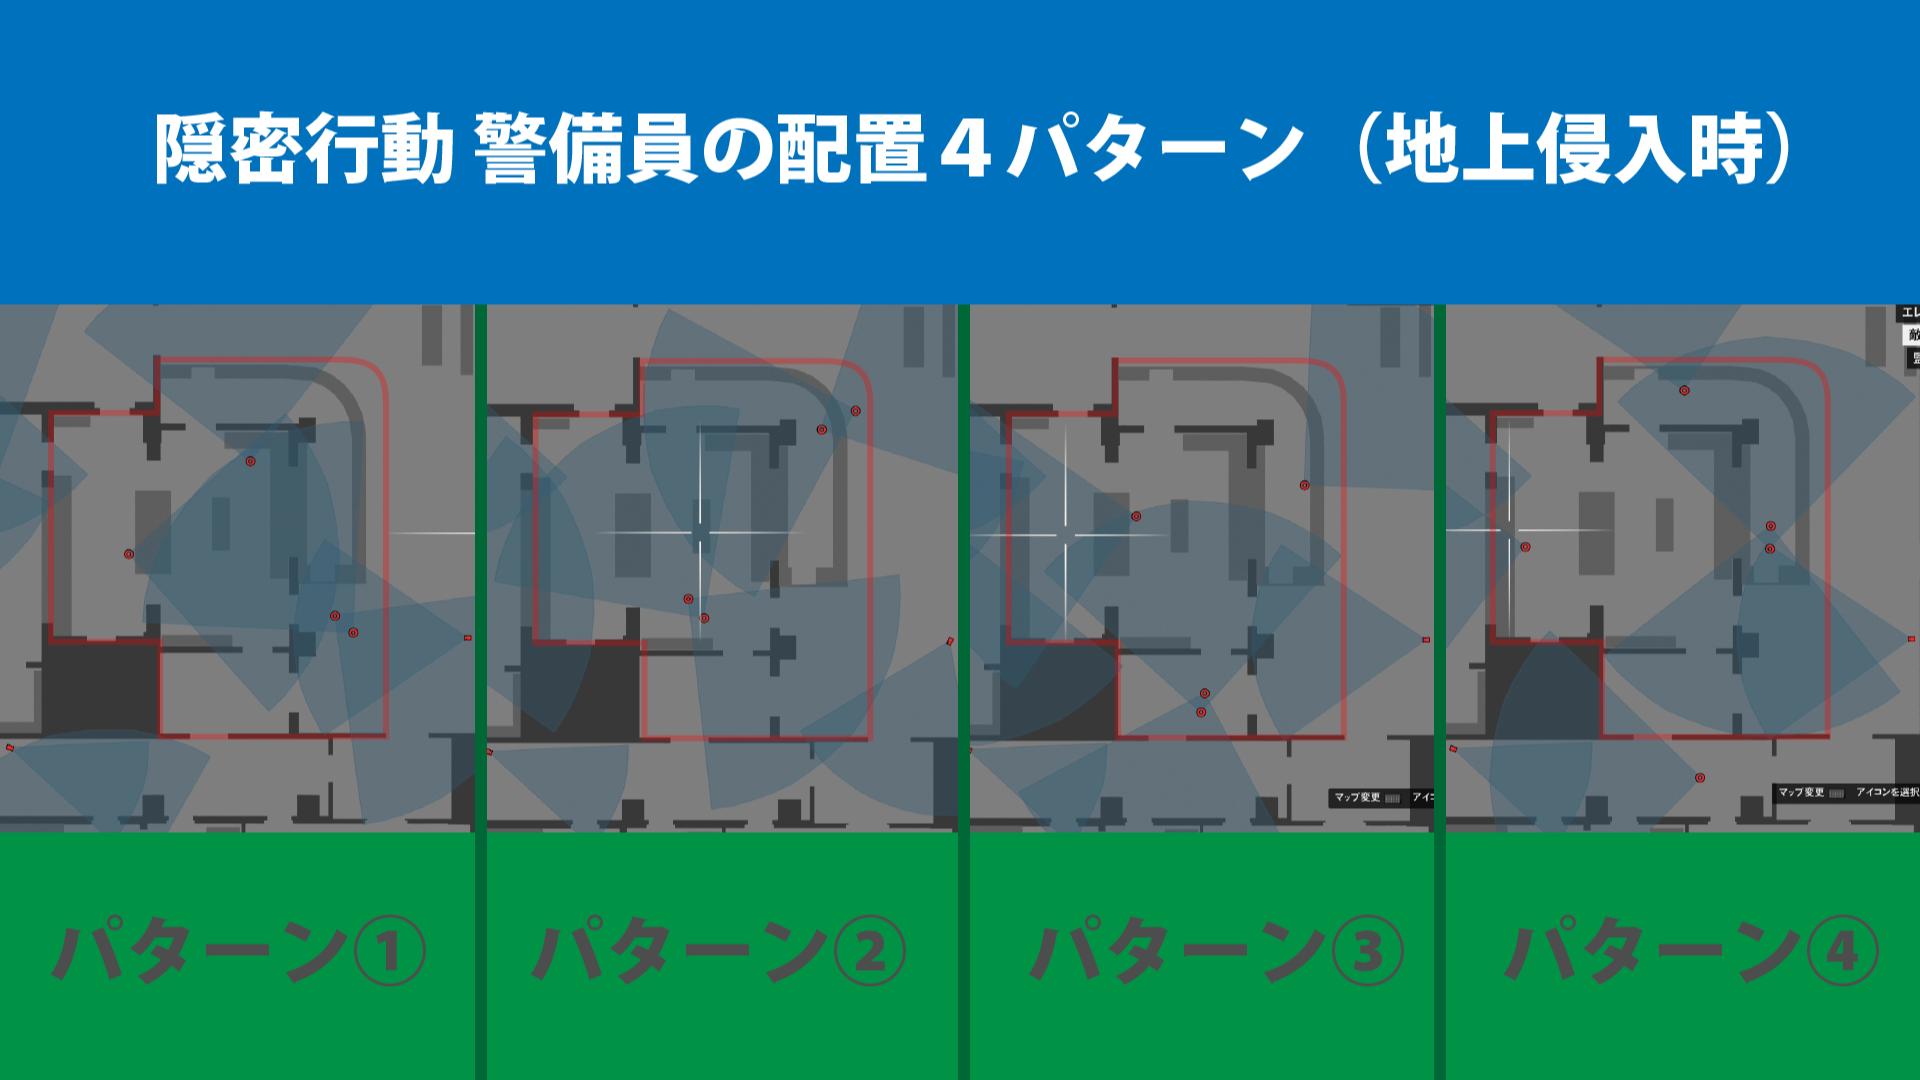 GTA5カジノ強盗敵(隠密行動)の敵の配置パターン